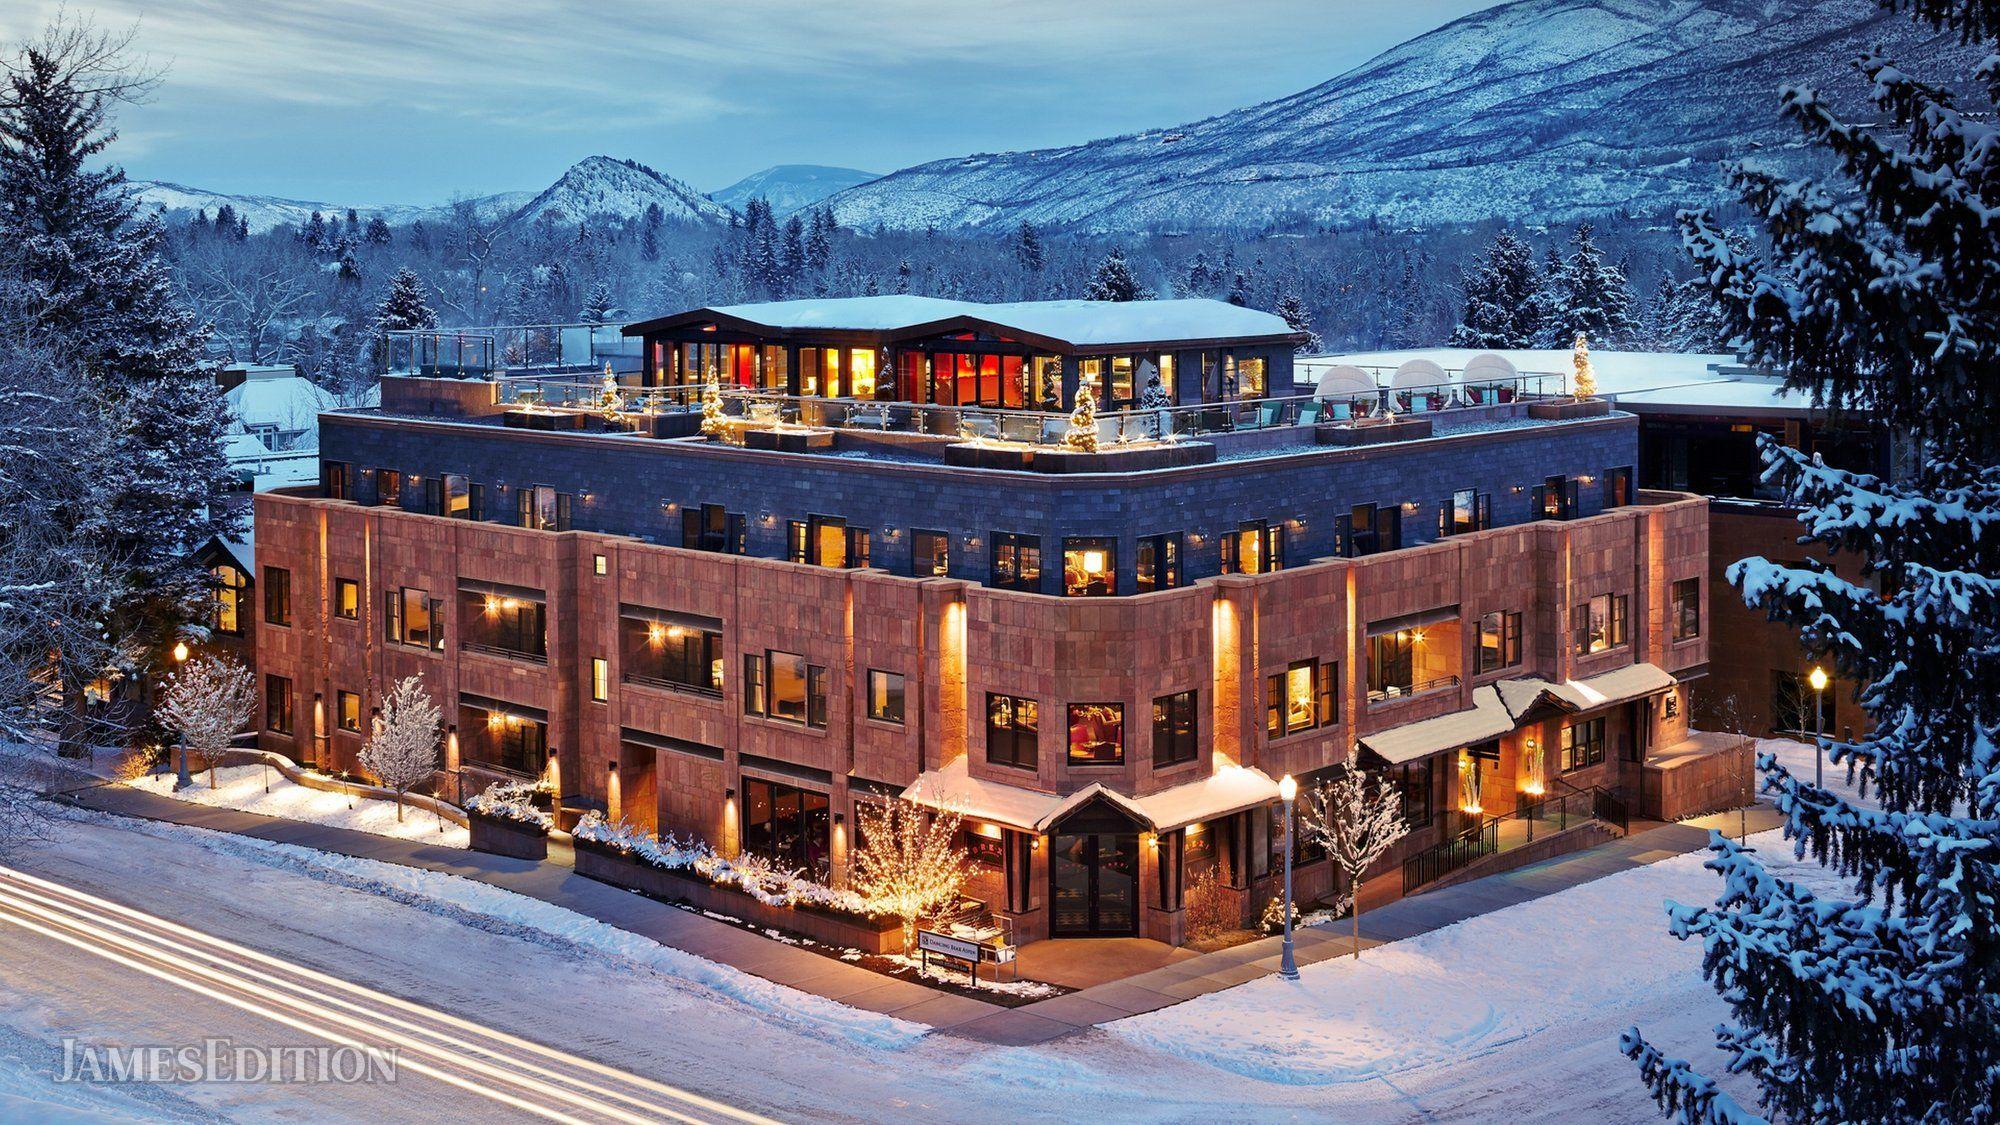 Aspen, Colorado, United States 1